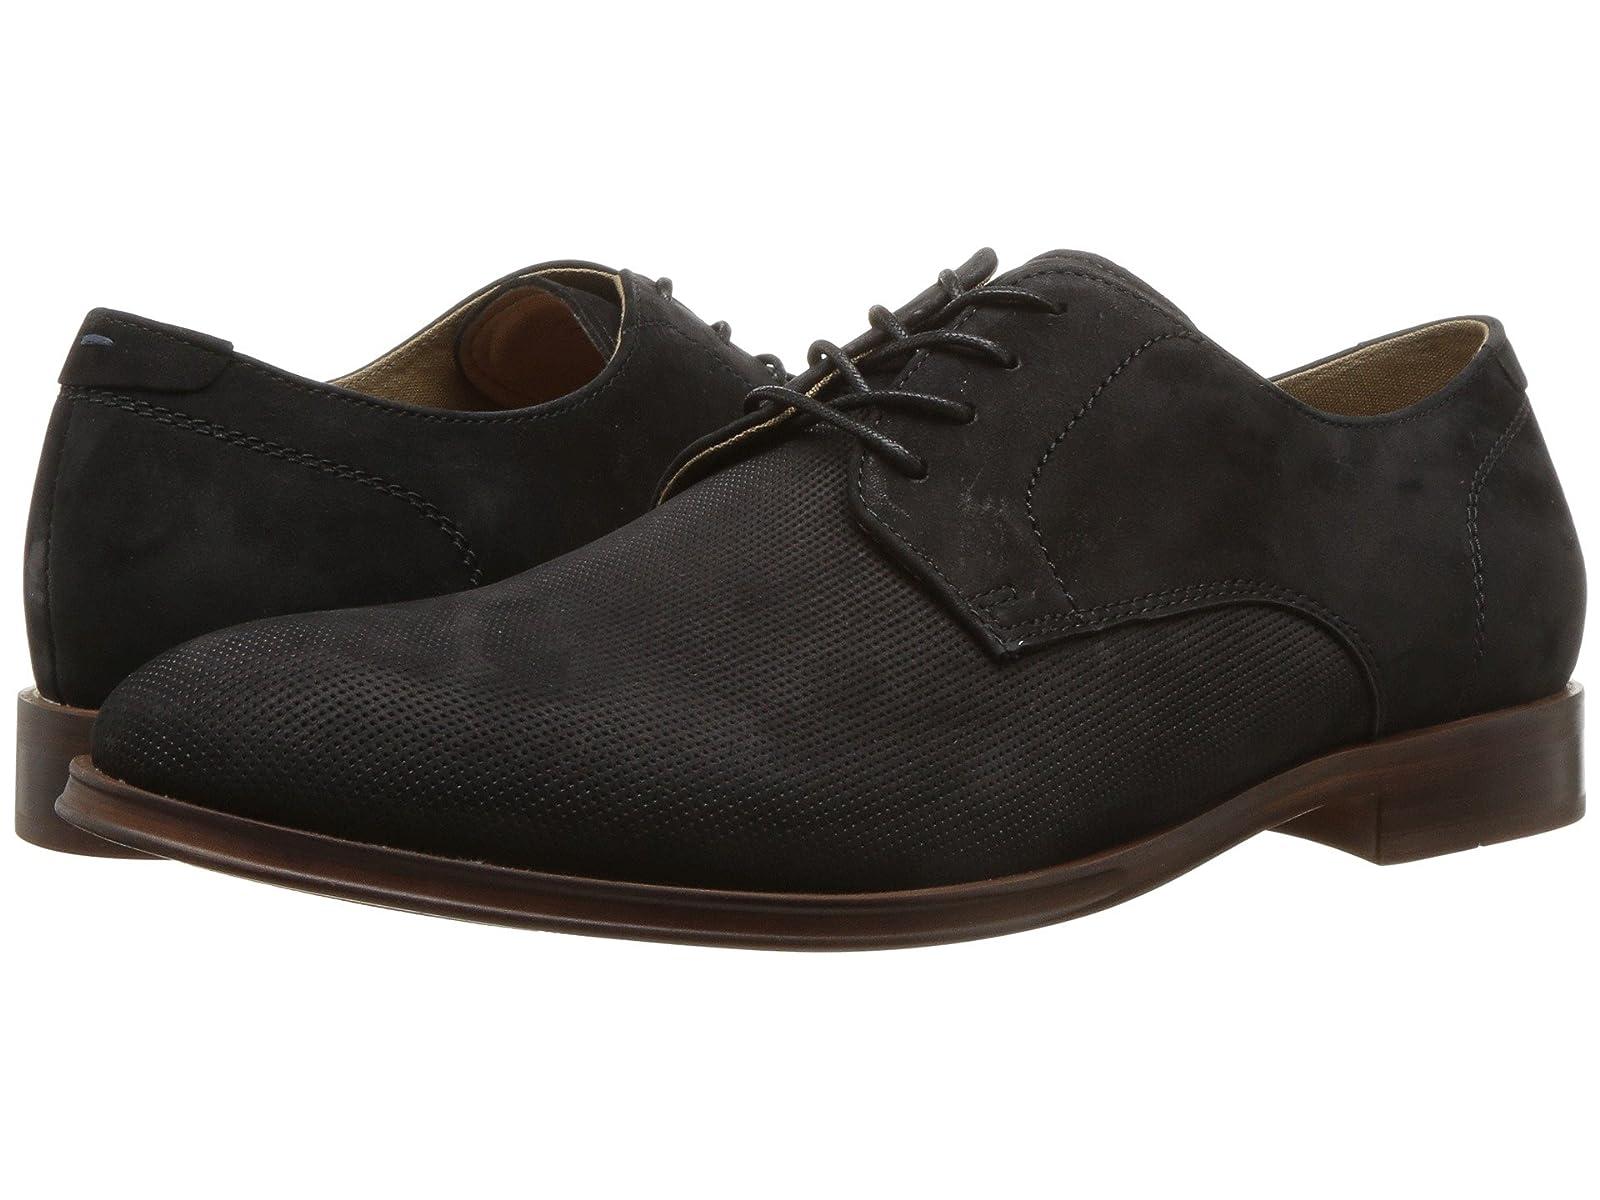 ALDO CriwiaCheap and distinctive eye-catching shoes